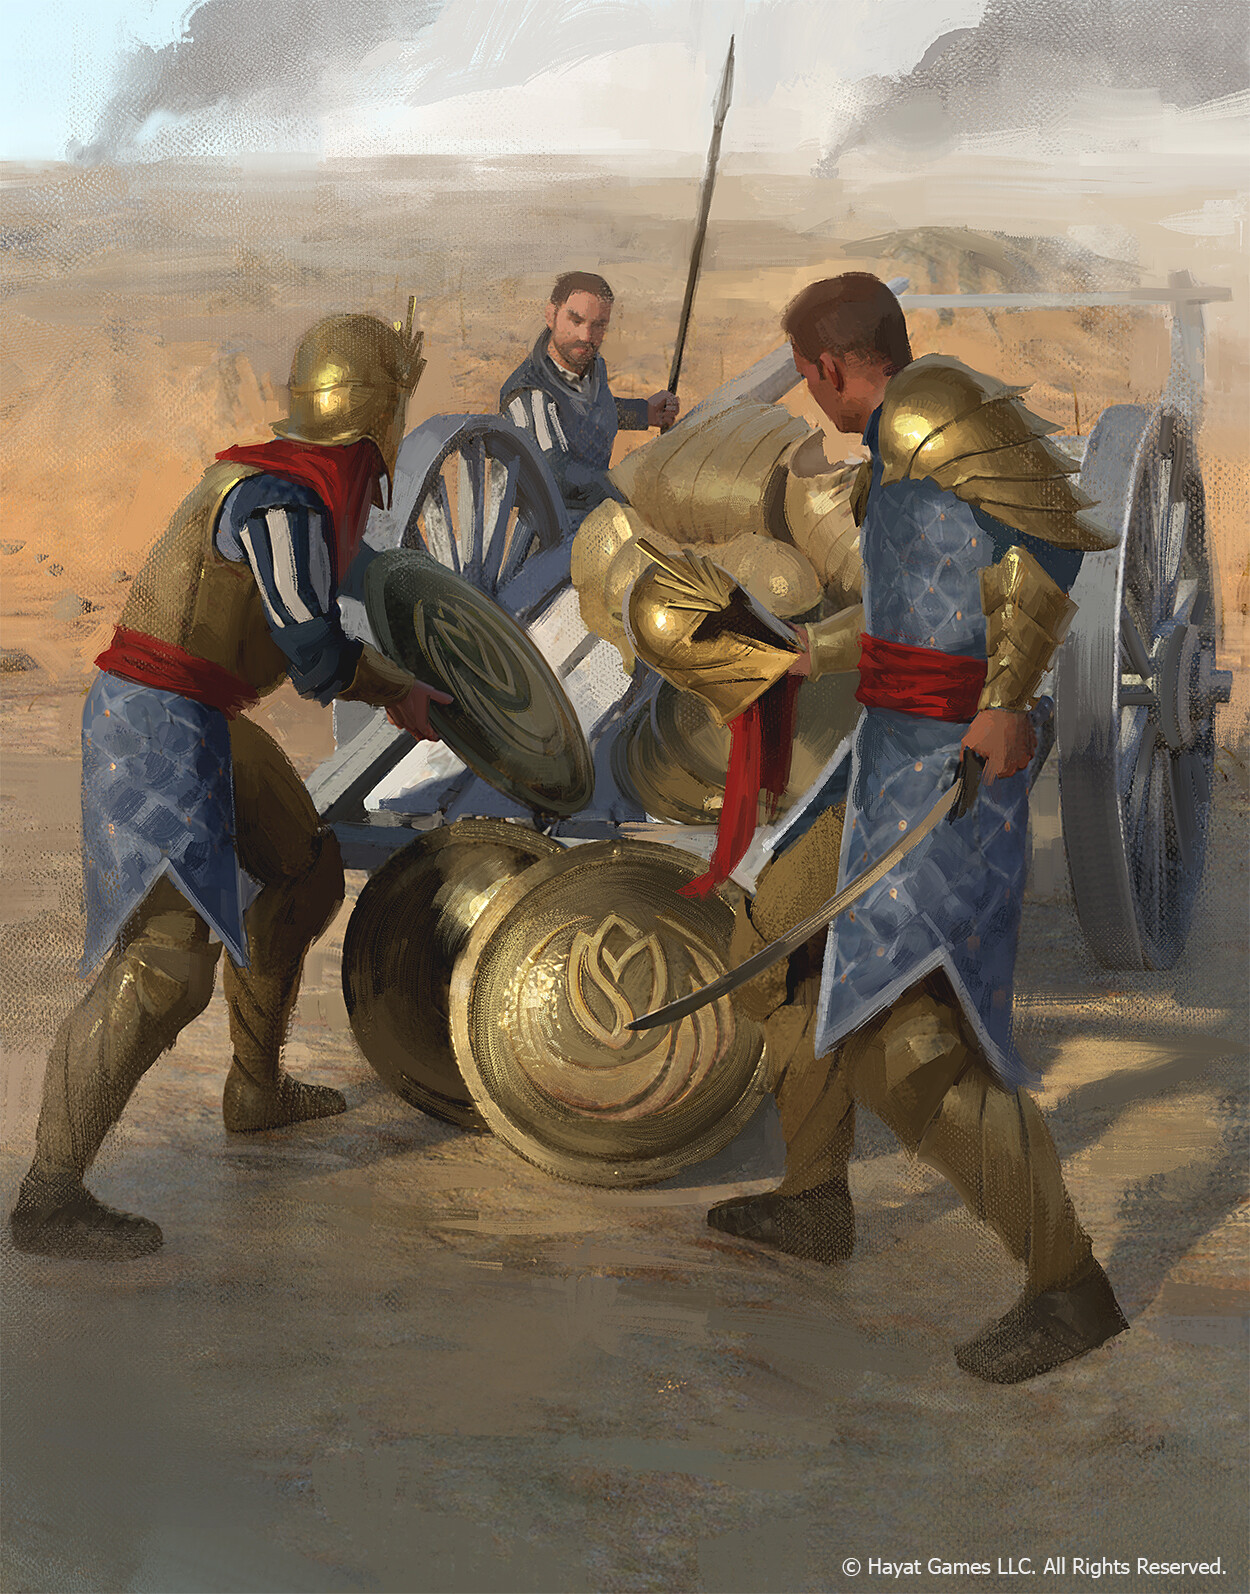 Armor Supply